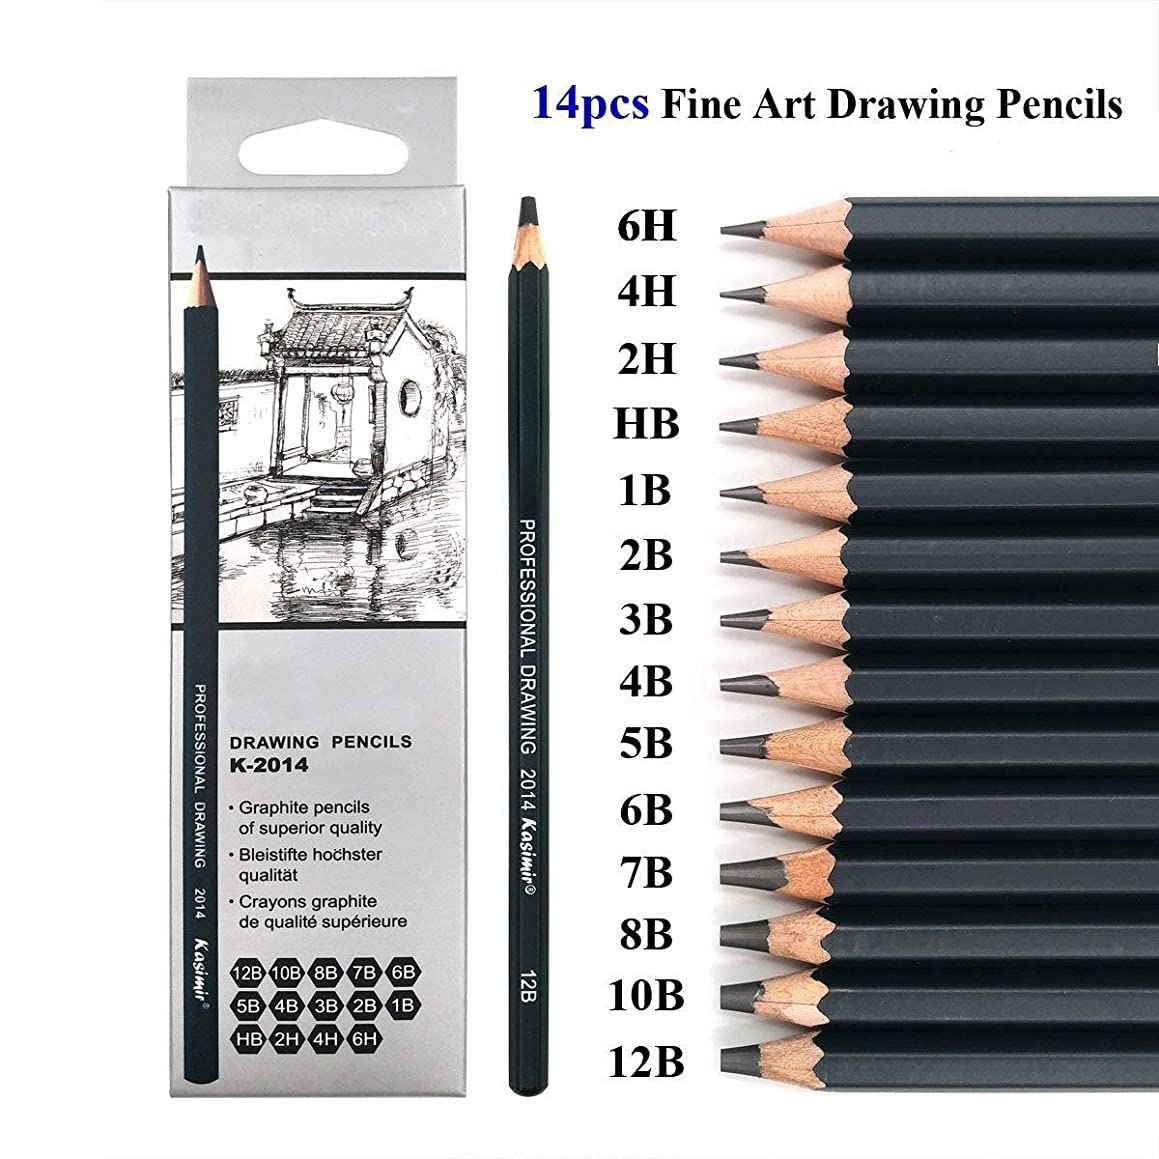 Sketching Pencils Set - 14 Pieces Drawing Pencils 6H, 4H, 2H, HB, B, 2B, 3B, 4B, 5B, 6B,7B, 8B, 10B, 12B